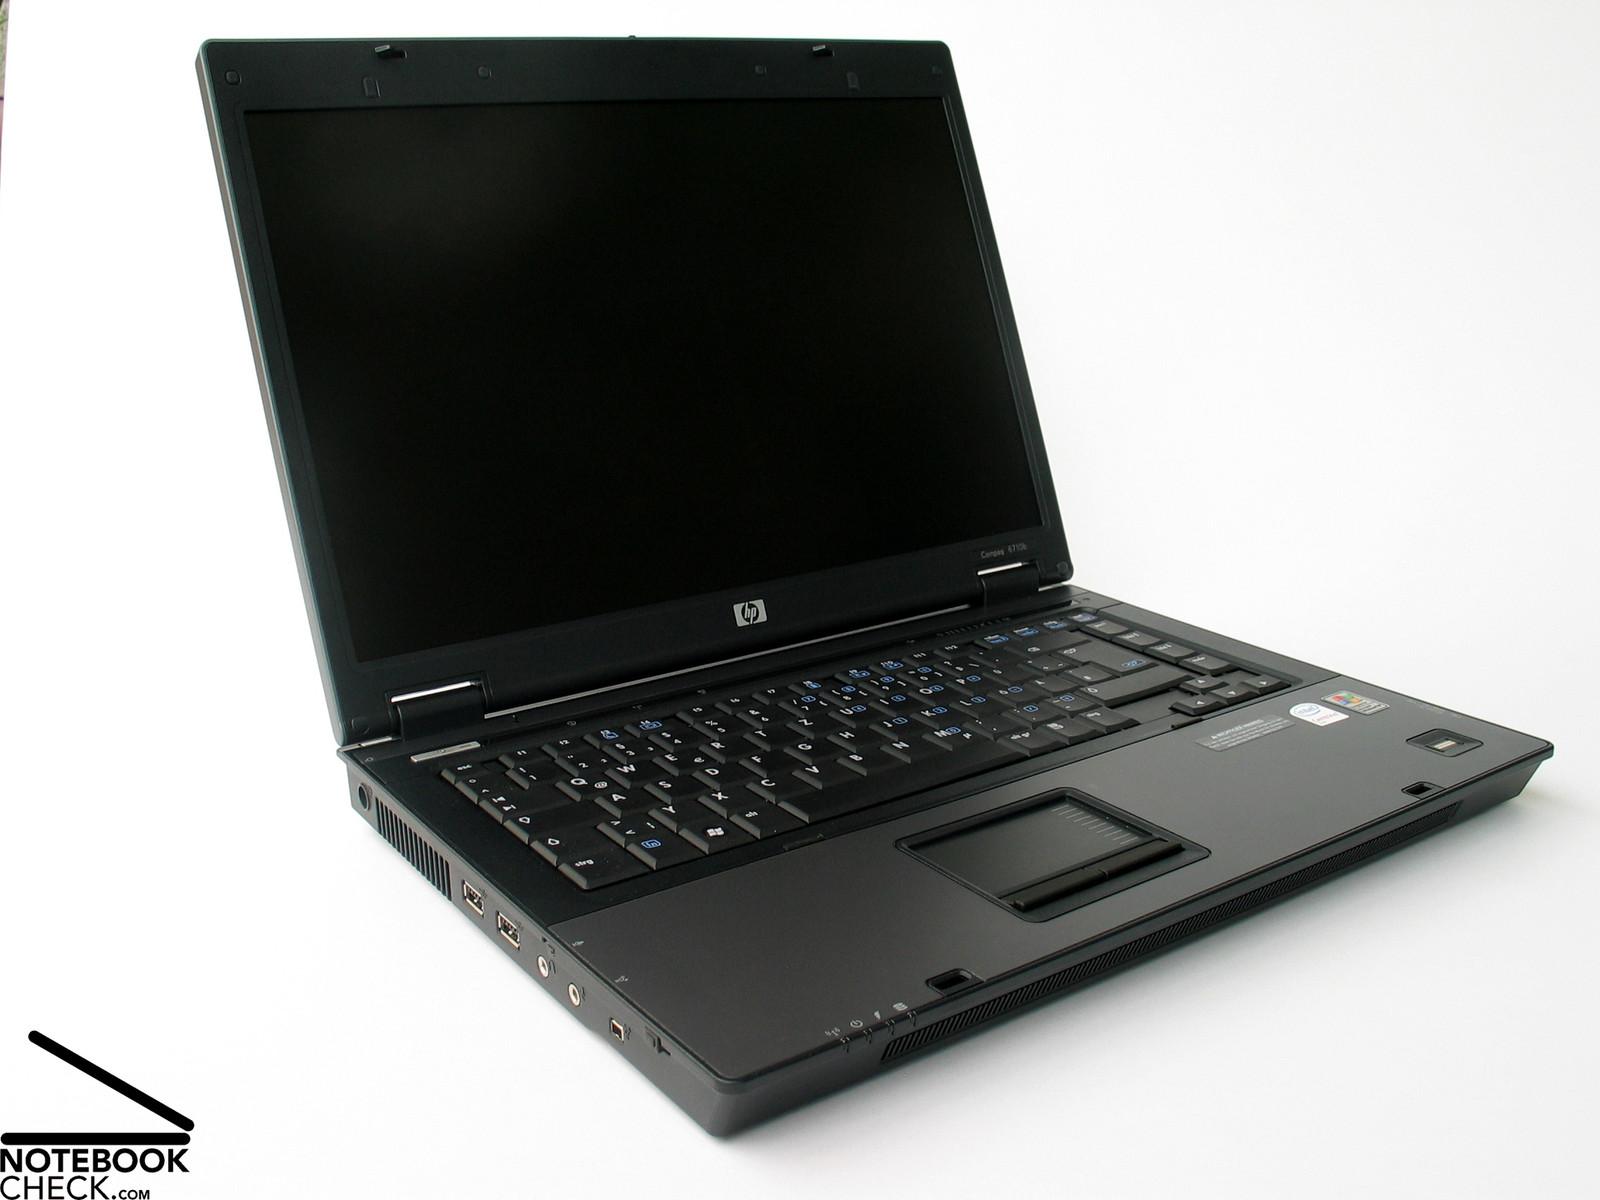 HP Compaq nx6325 Notebook Seagate HDD Download Driver